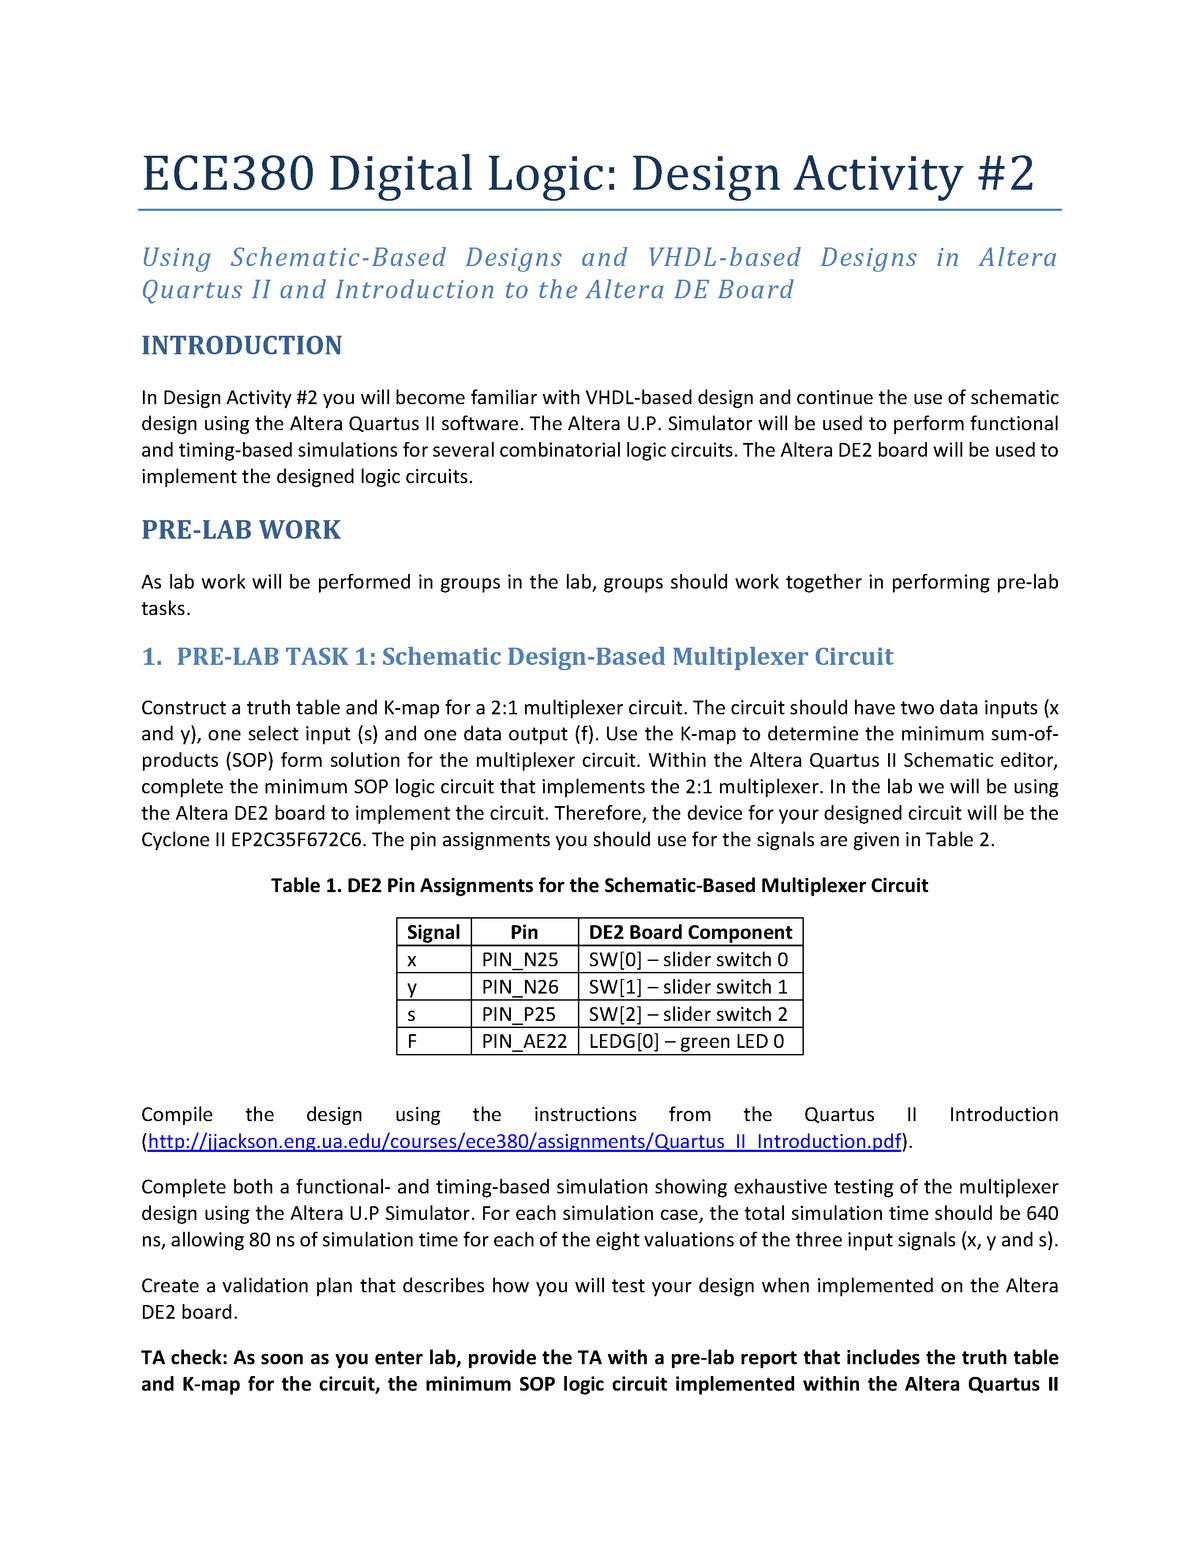 LAB 2 Friday, June 6, 2014 - ECE 380: Digital Logic - StuDocu